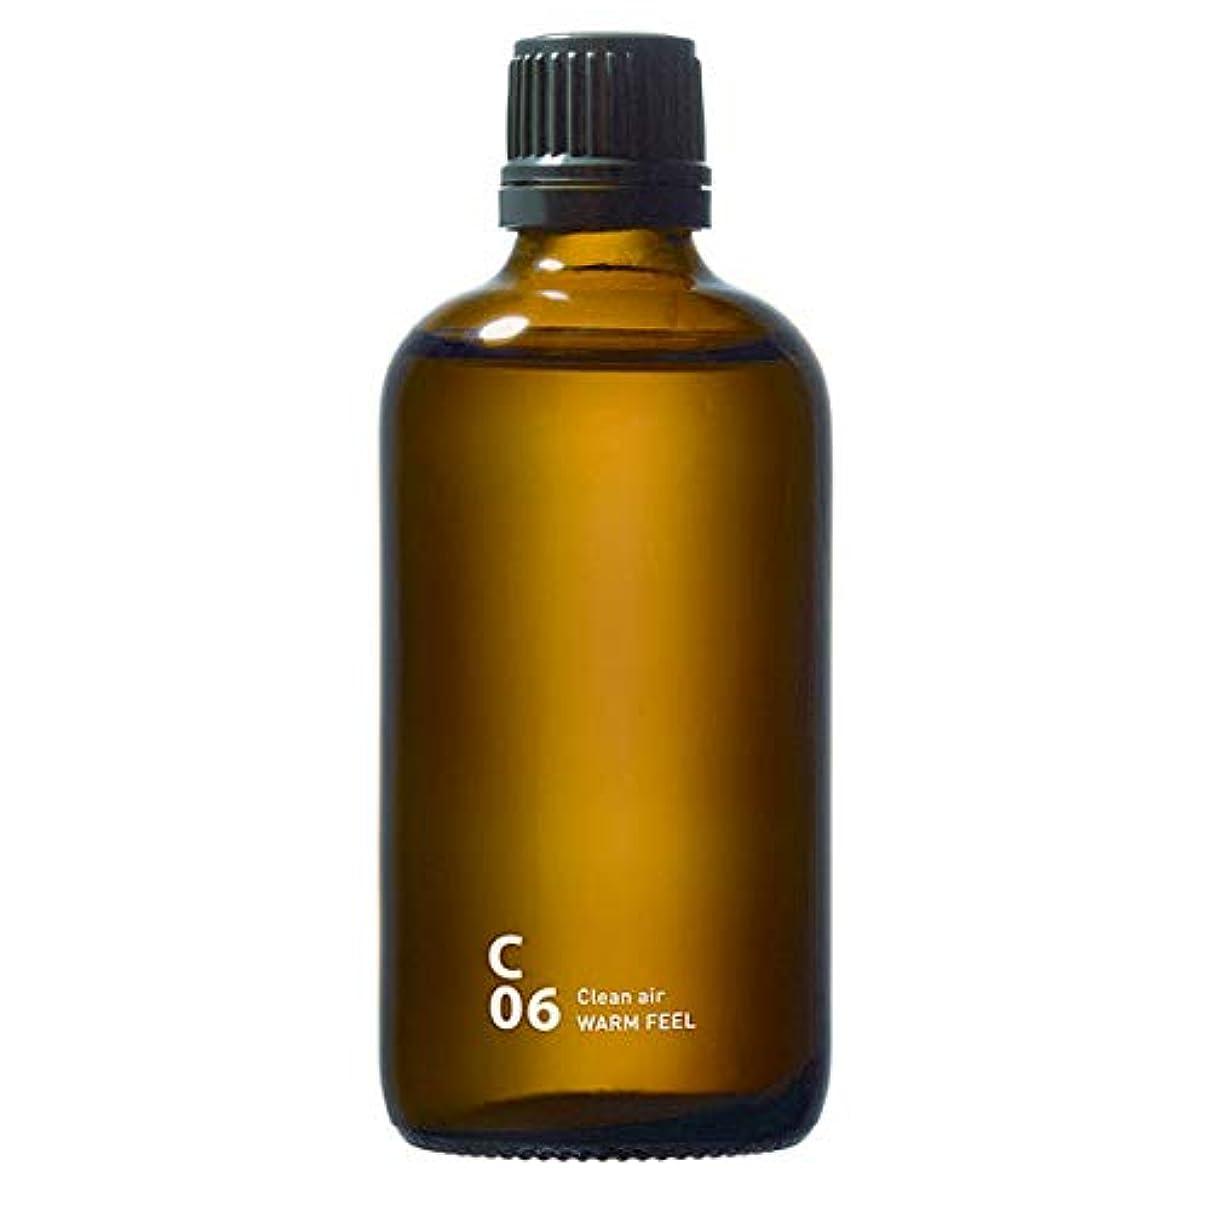 C06 WARM FEEL piezo aroma oil 100ml